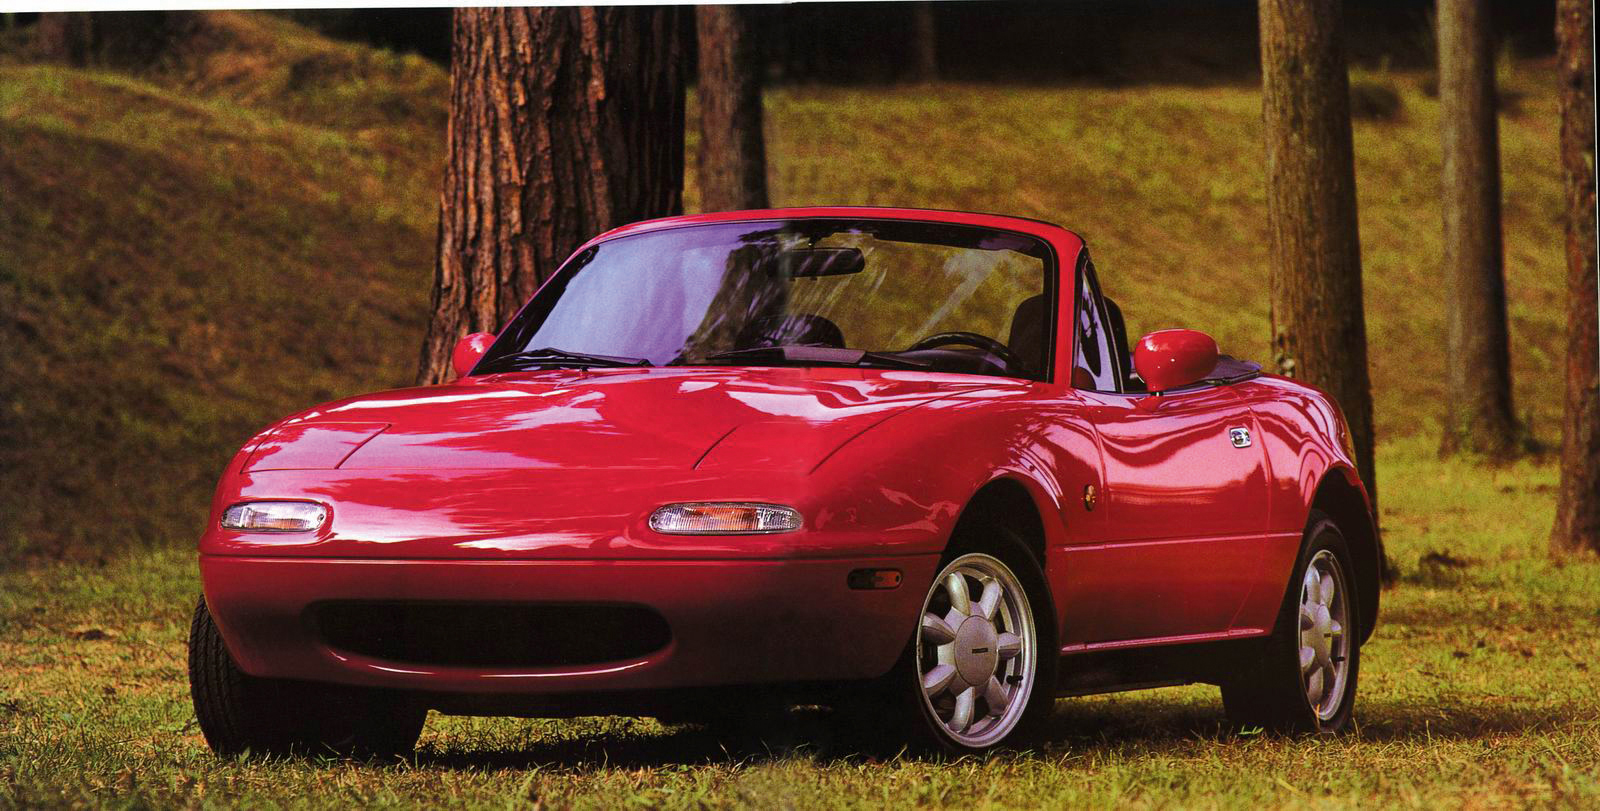 Mazda MX-5 : la naissance du mythe